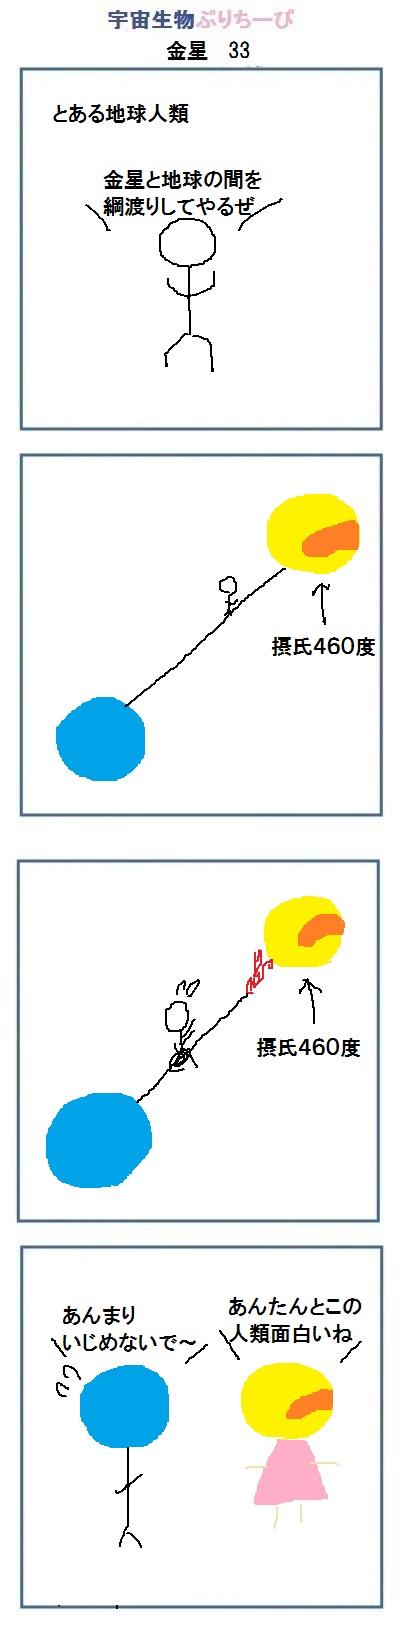 160629_kinsei33.jpg